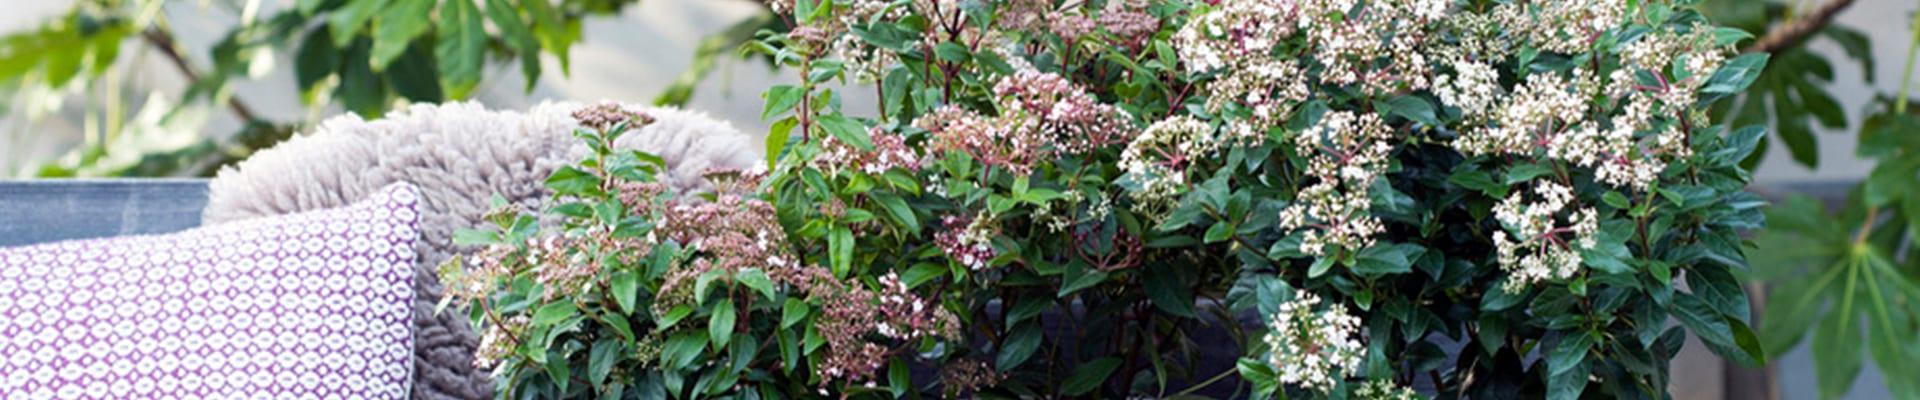 Tuinplant van de Maand februari: Sneeuwbal (Viburnum)